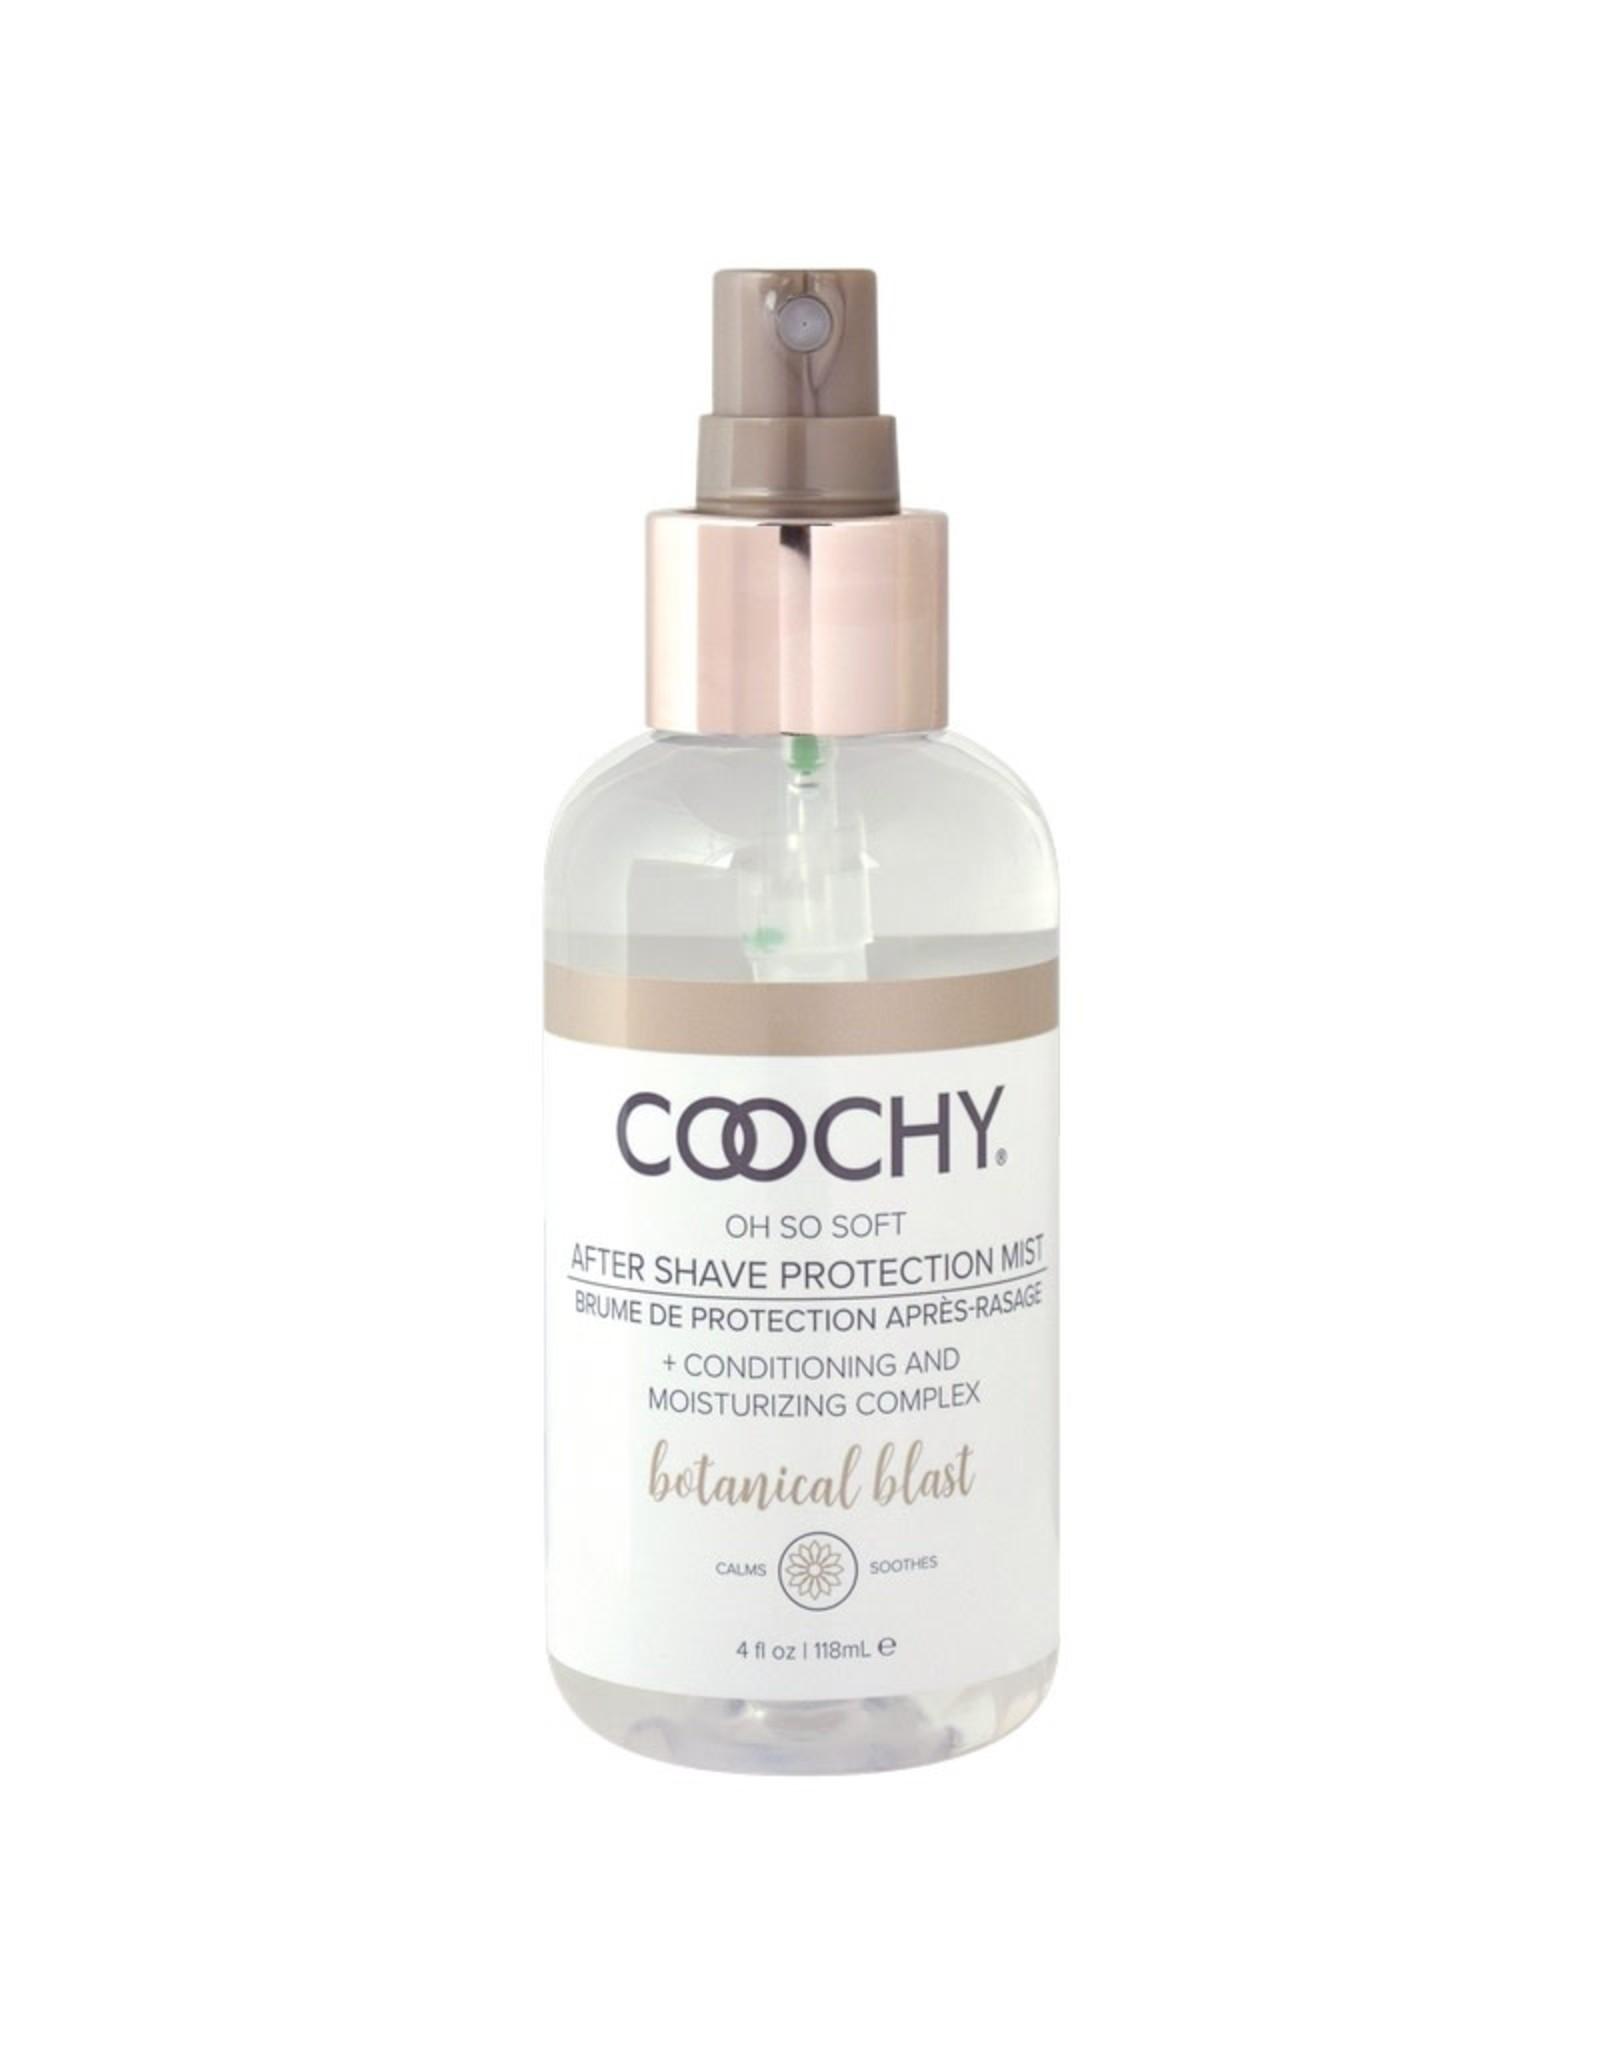 Coochy Coochy - After Shave Protection Mist - Botanical Blast - 4oz